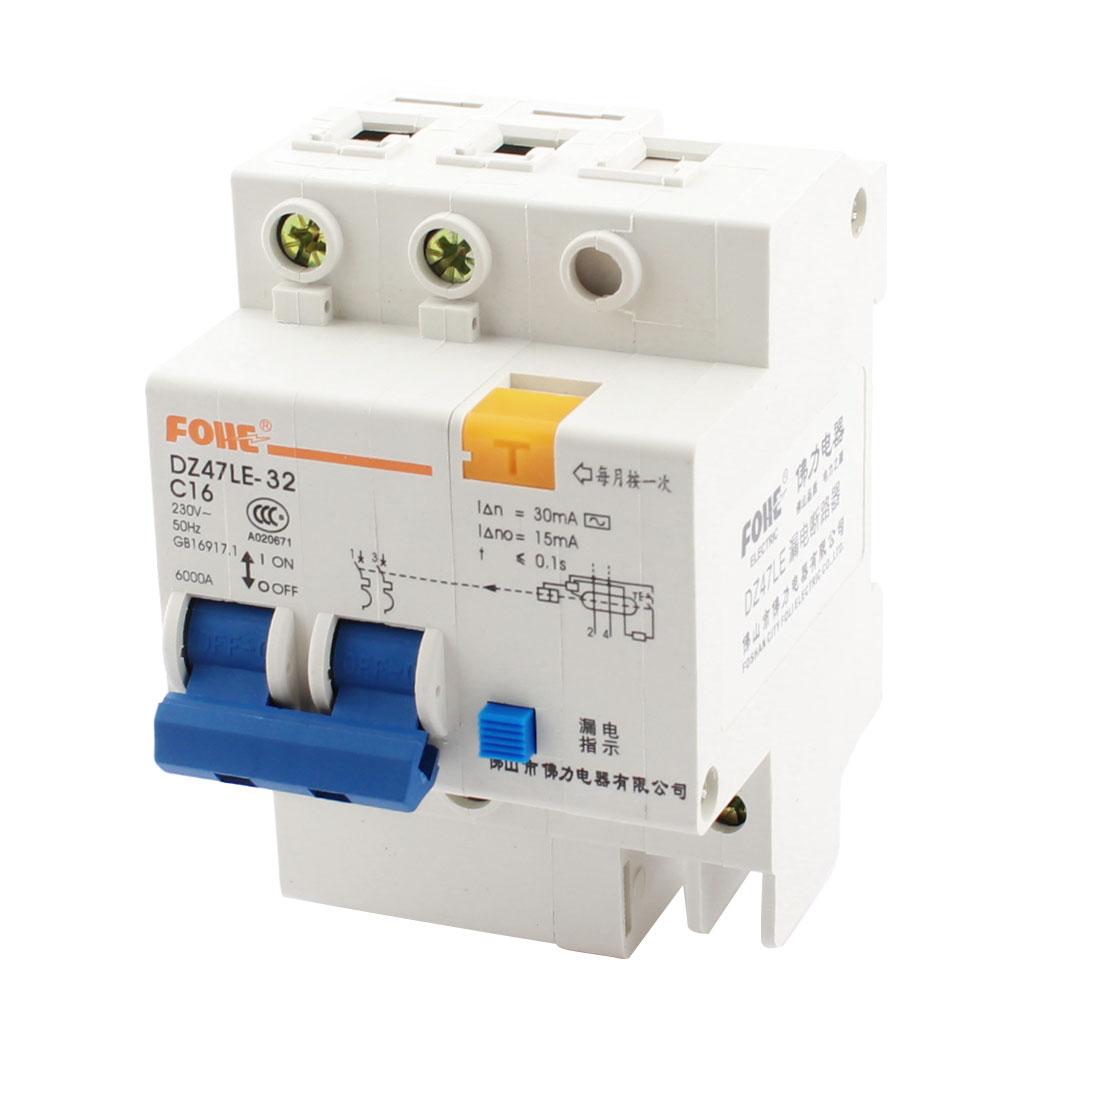 AC230V 16A DZ47LE-32 2 Phase 6kA Overload Circuit Breaker w Lead Rail